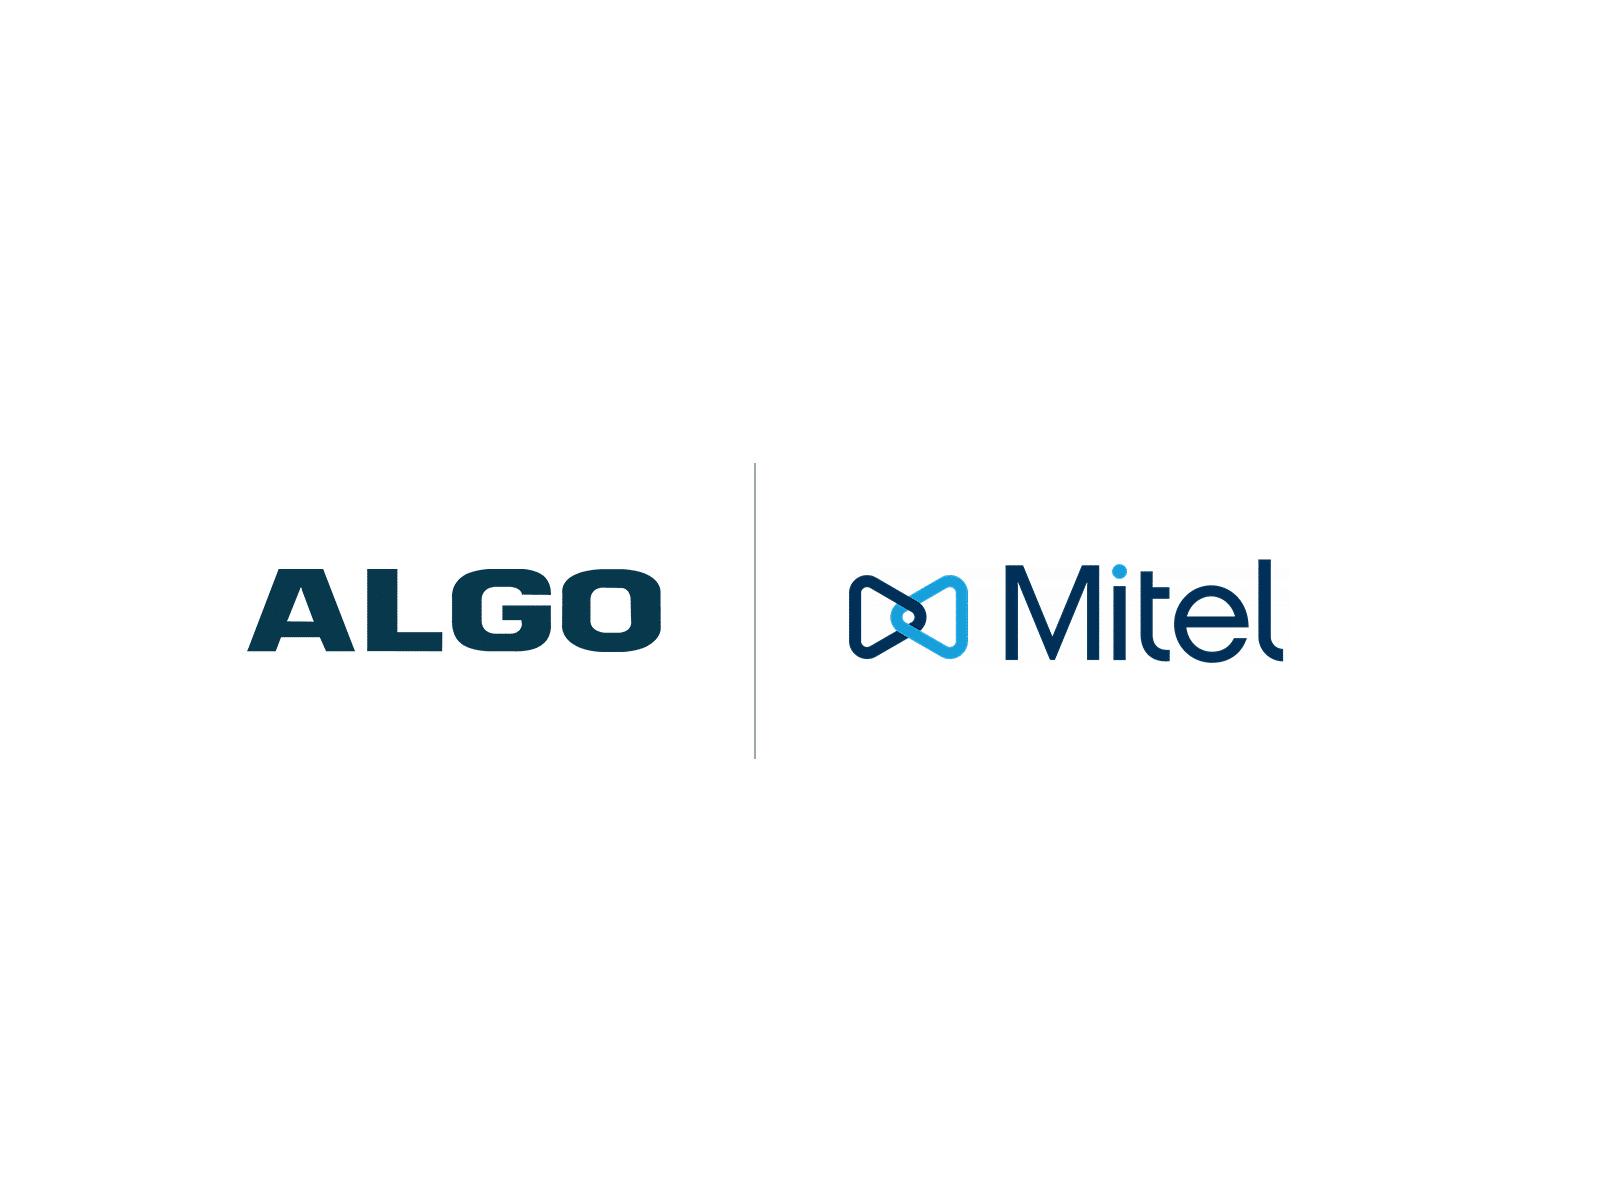 Algo Mitel Compatibility Logo